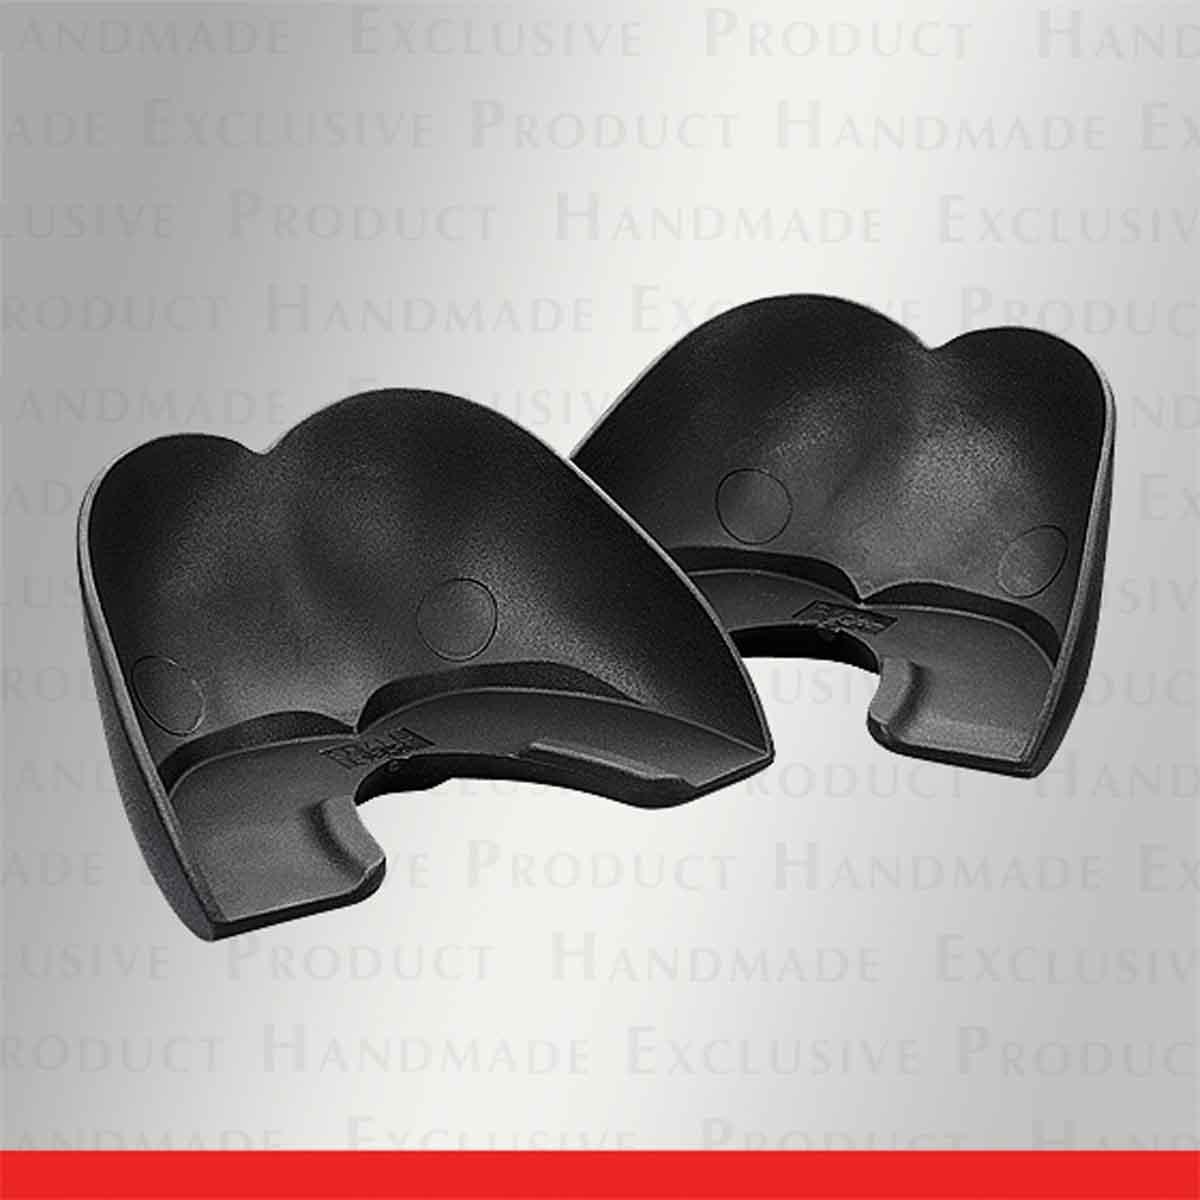 Shoe Secure